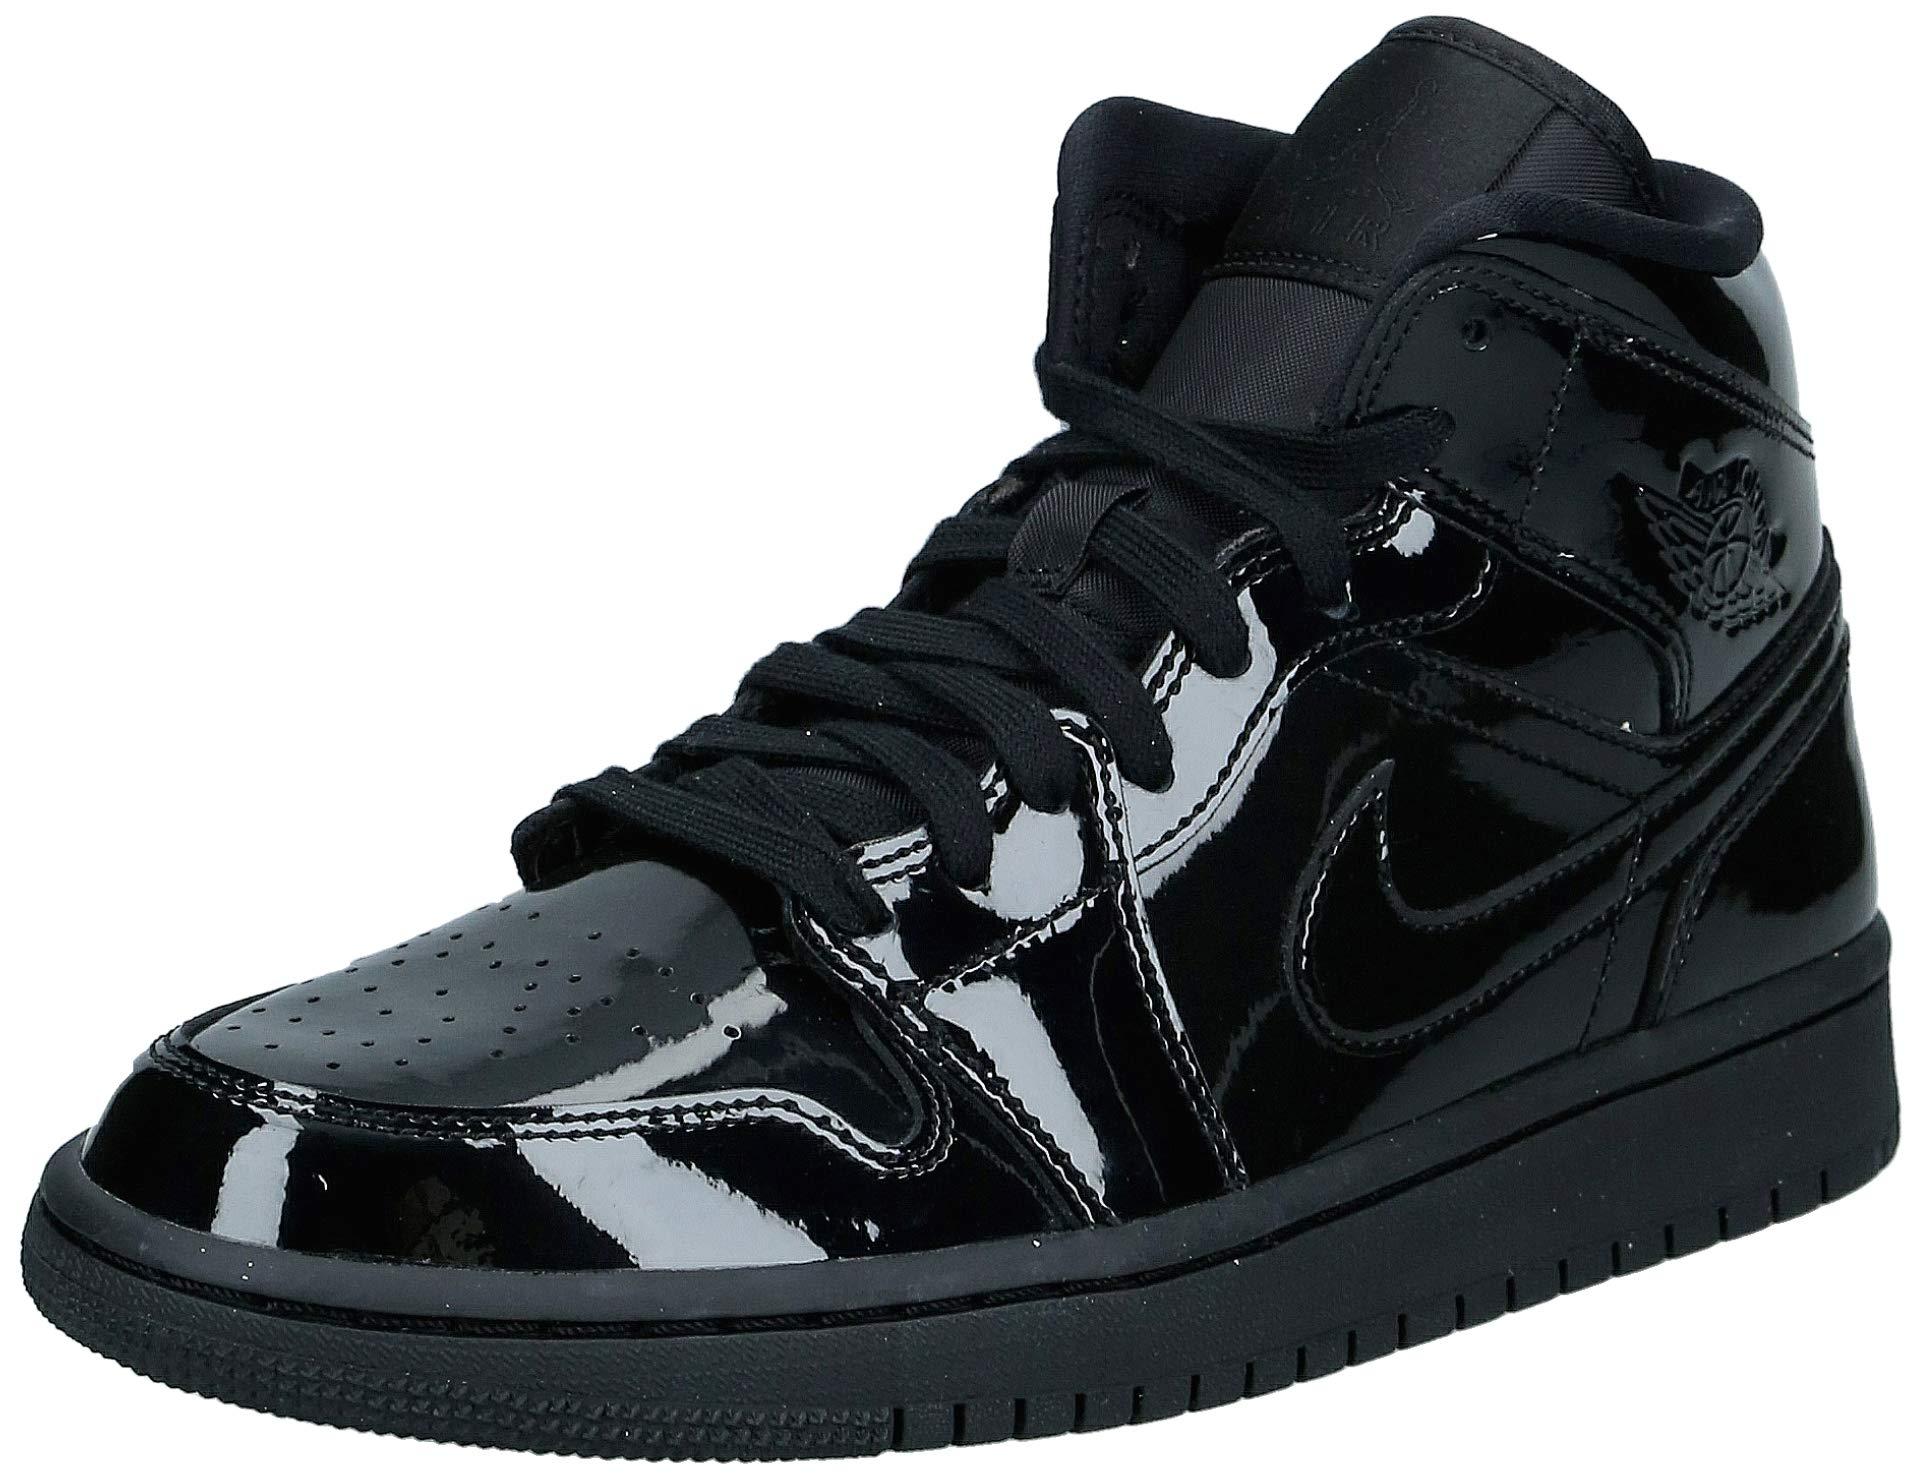 Nike Womens Air Jordan 1 Mid Womens Bq6472-002 Size